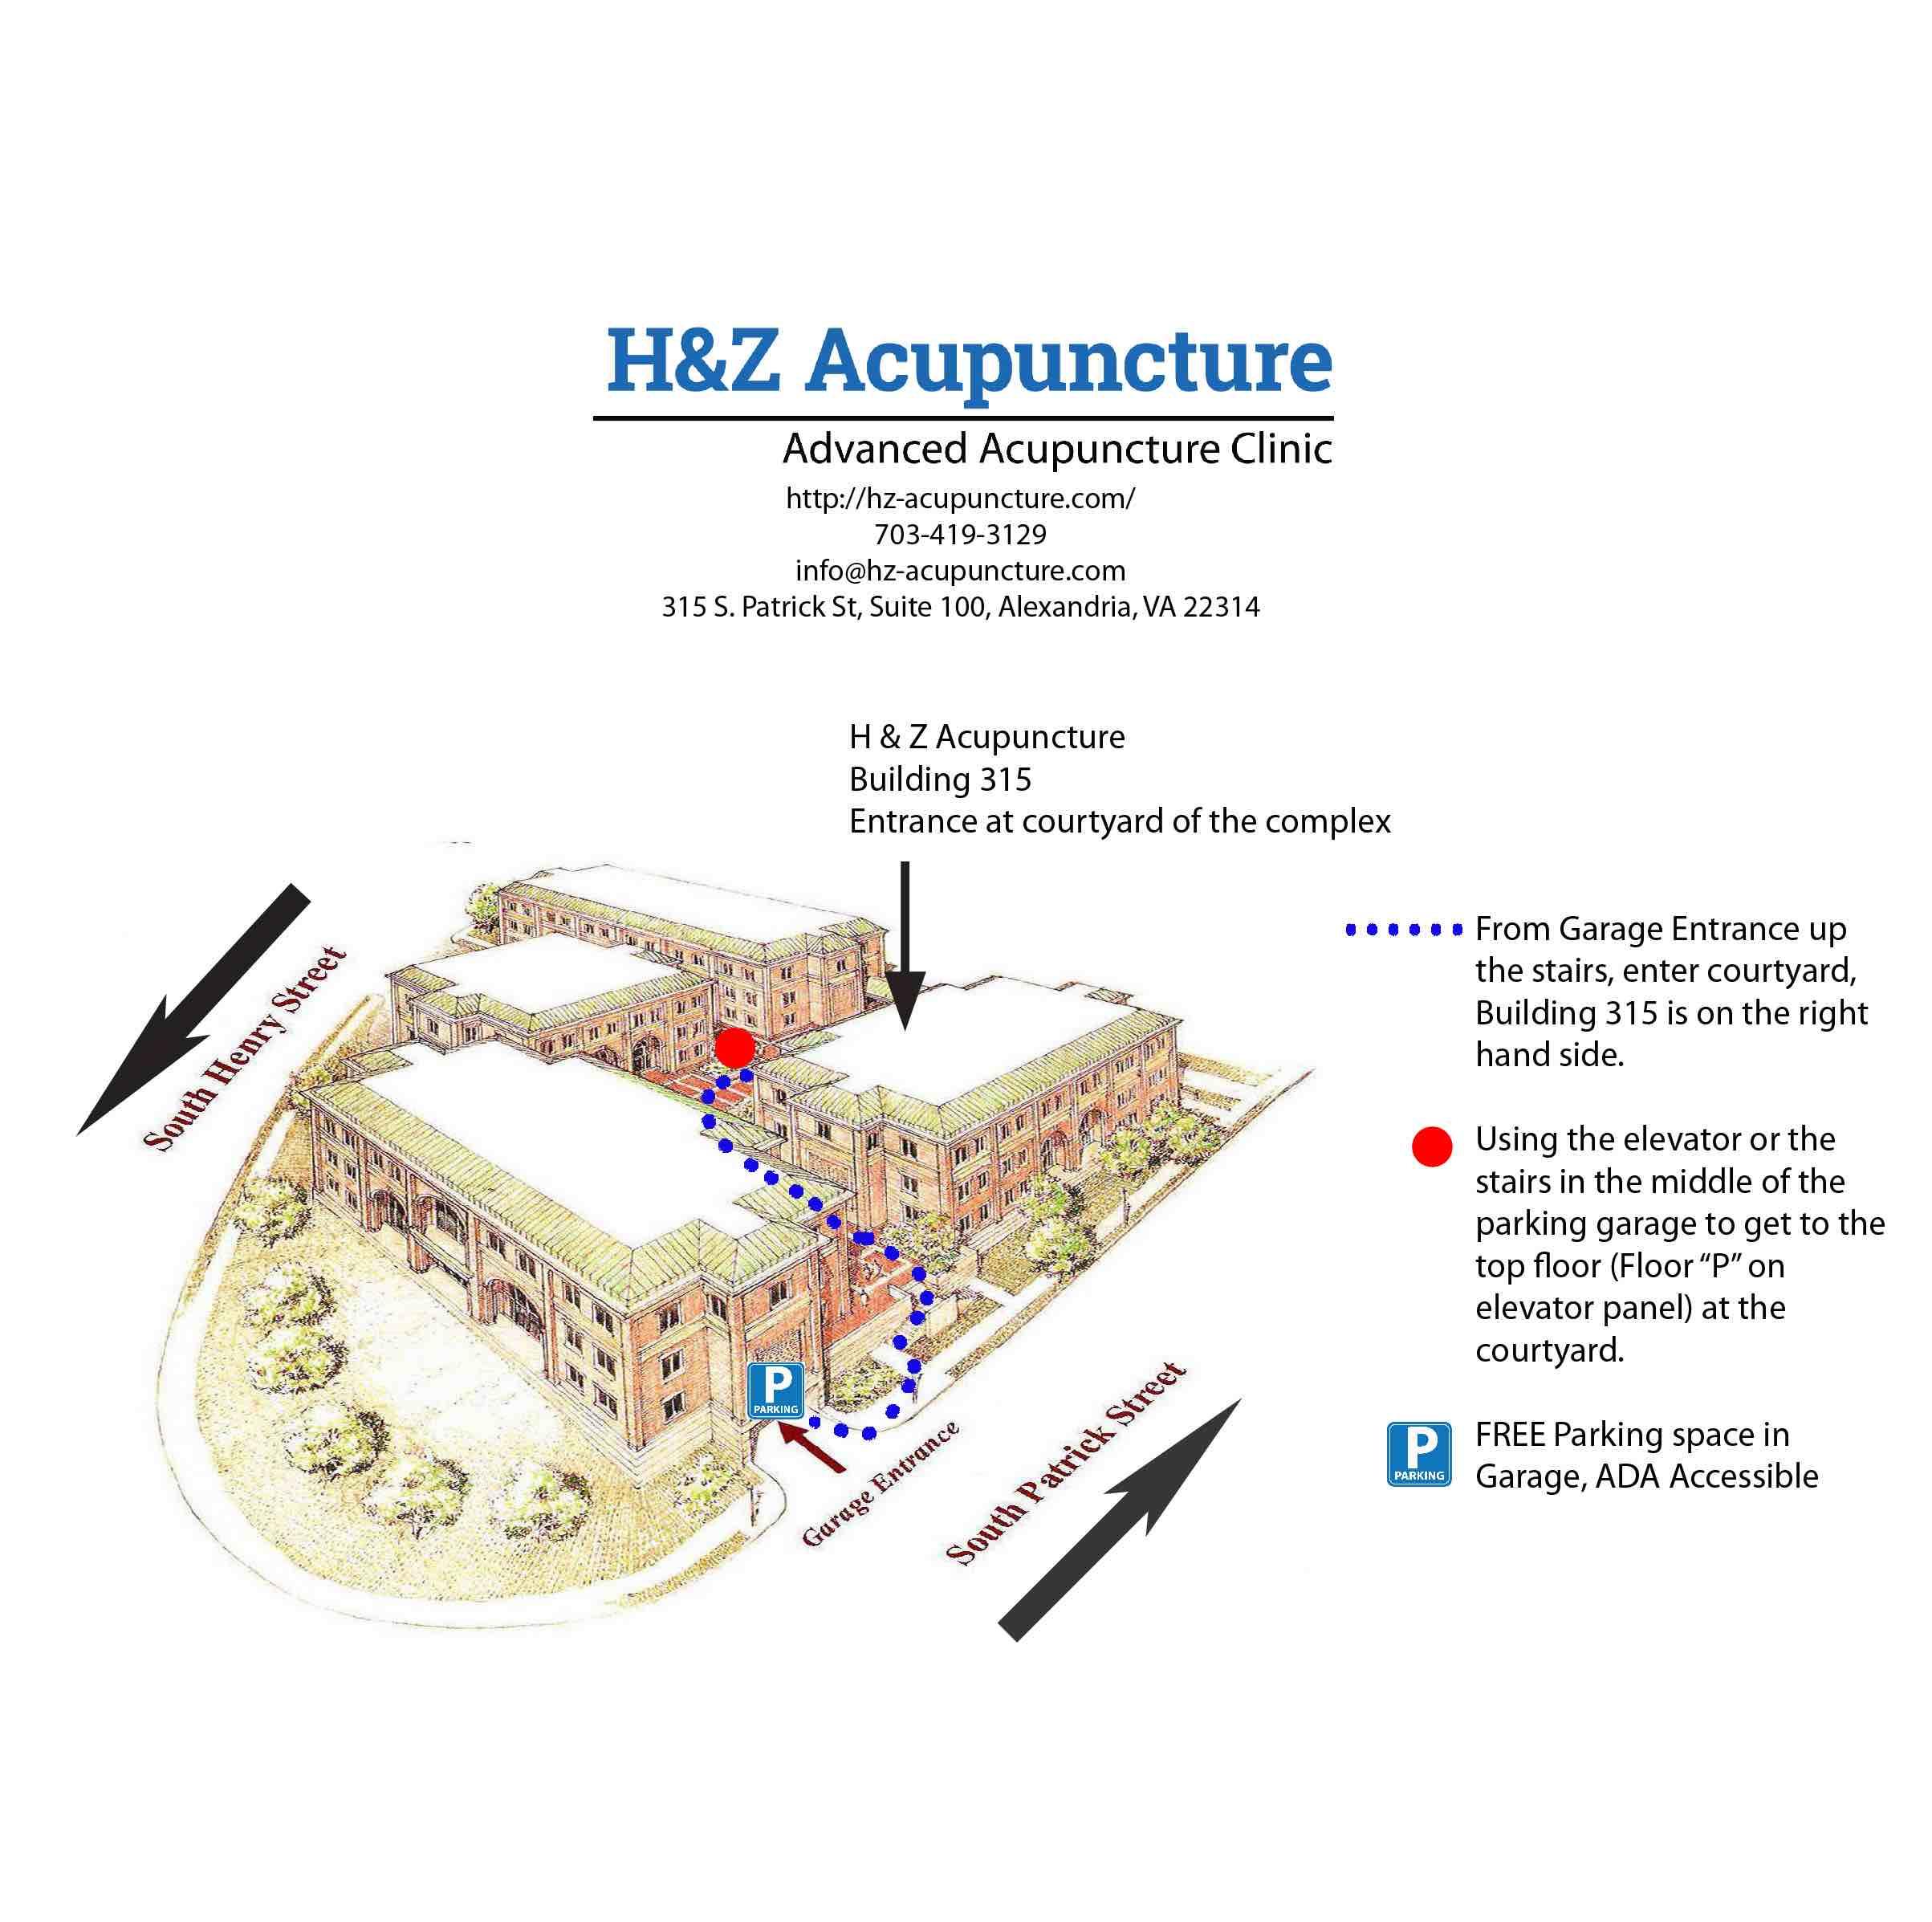 H&Z Acupuncture Entrance Direction